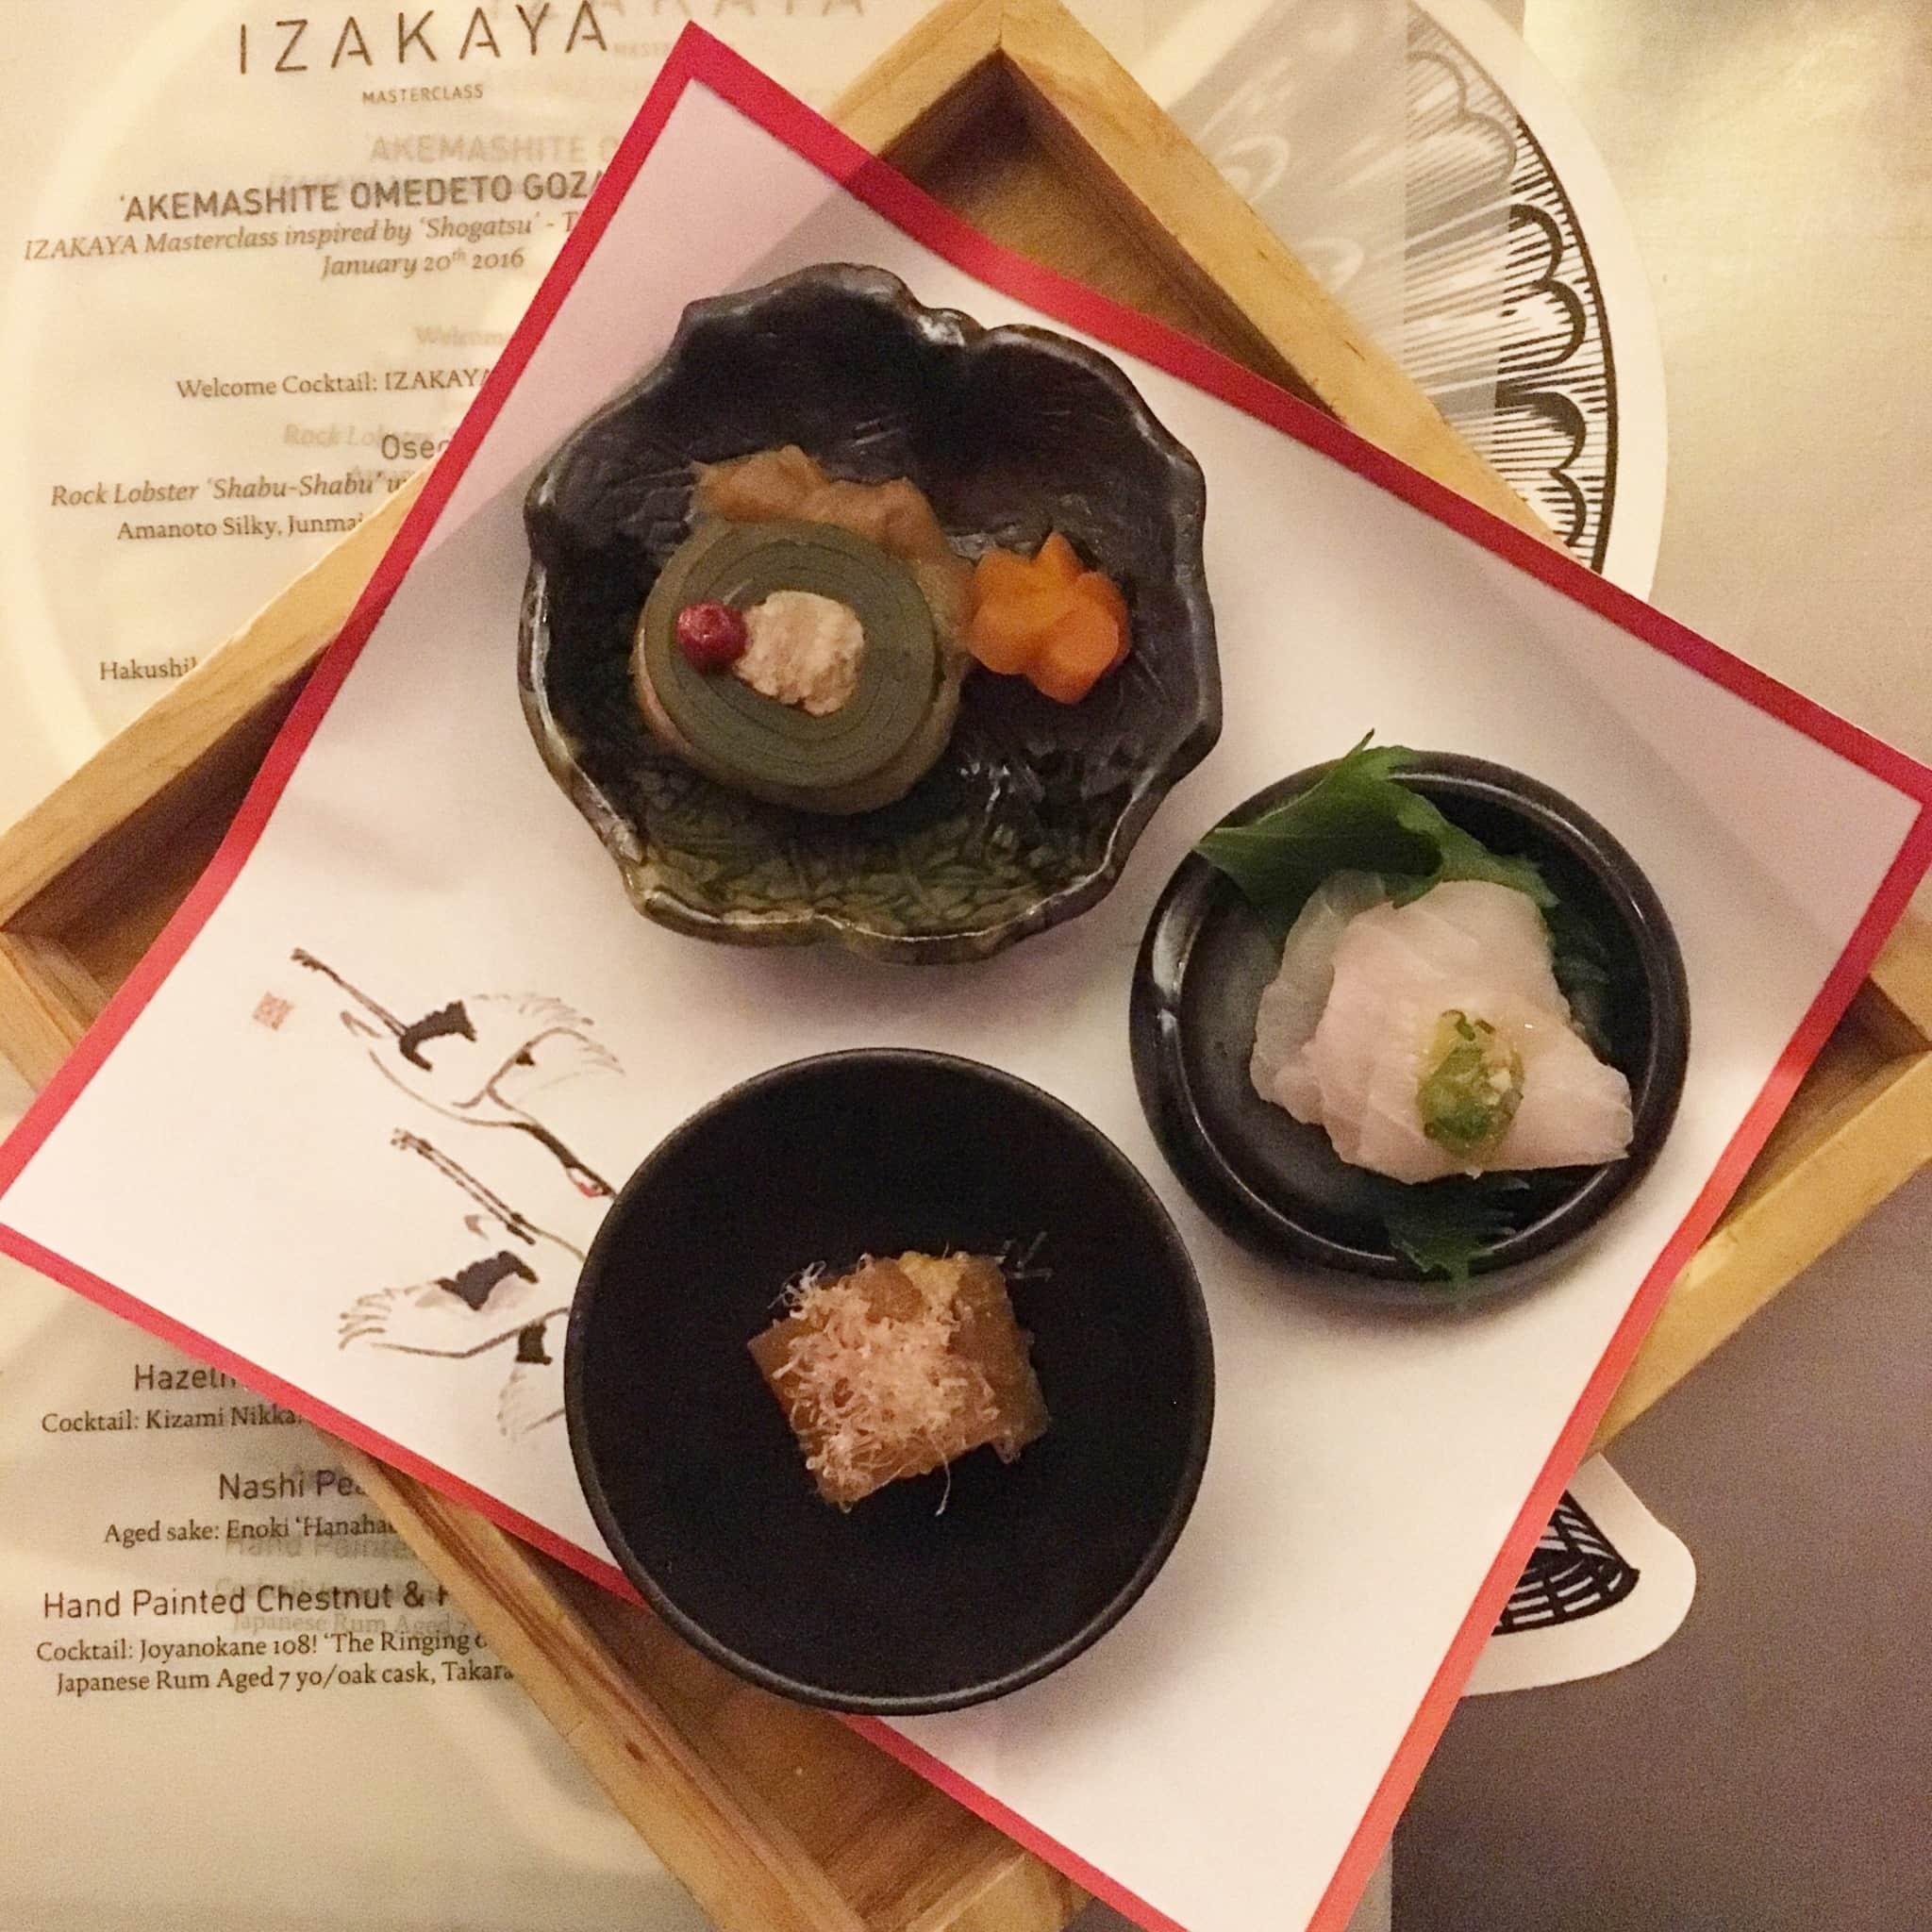 image 43 - Restaurant Izakaya - Masterclass Shogatsu